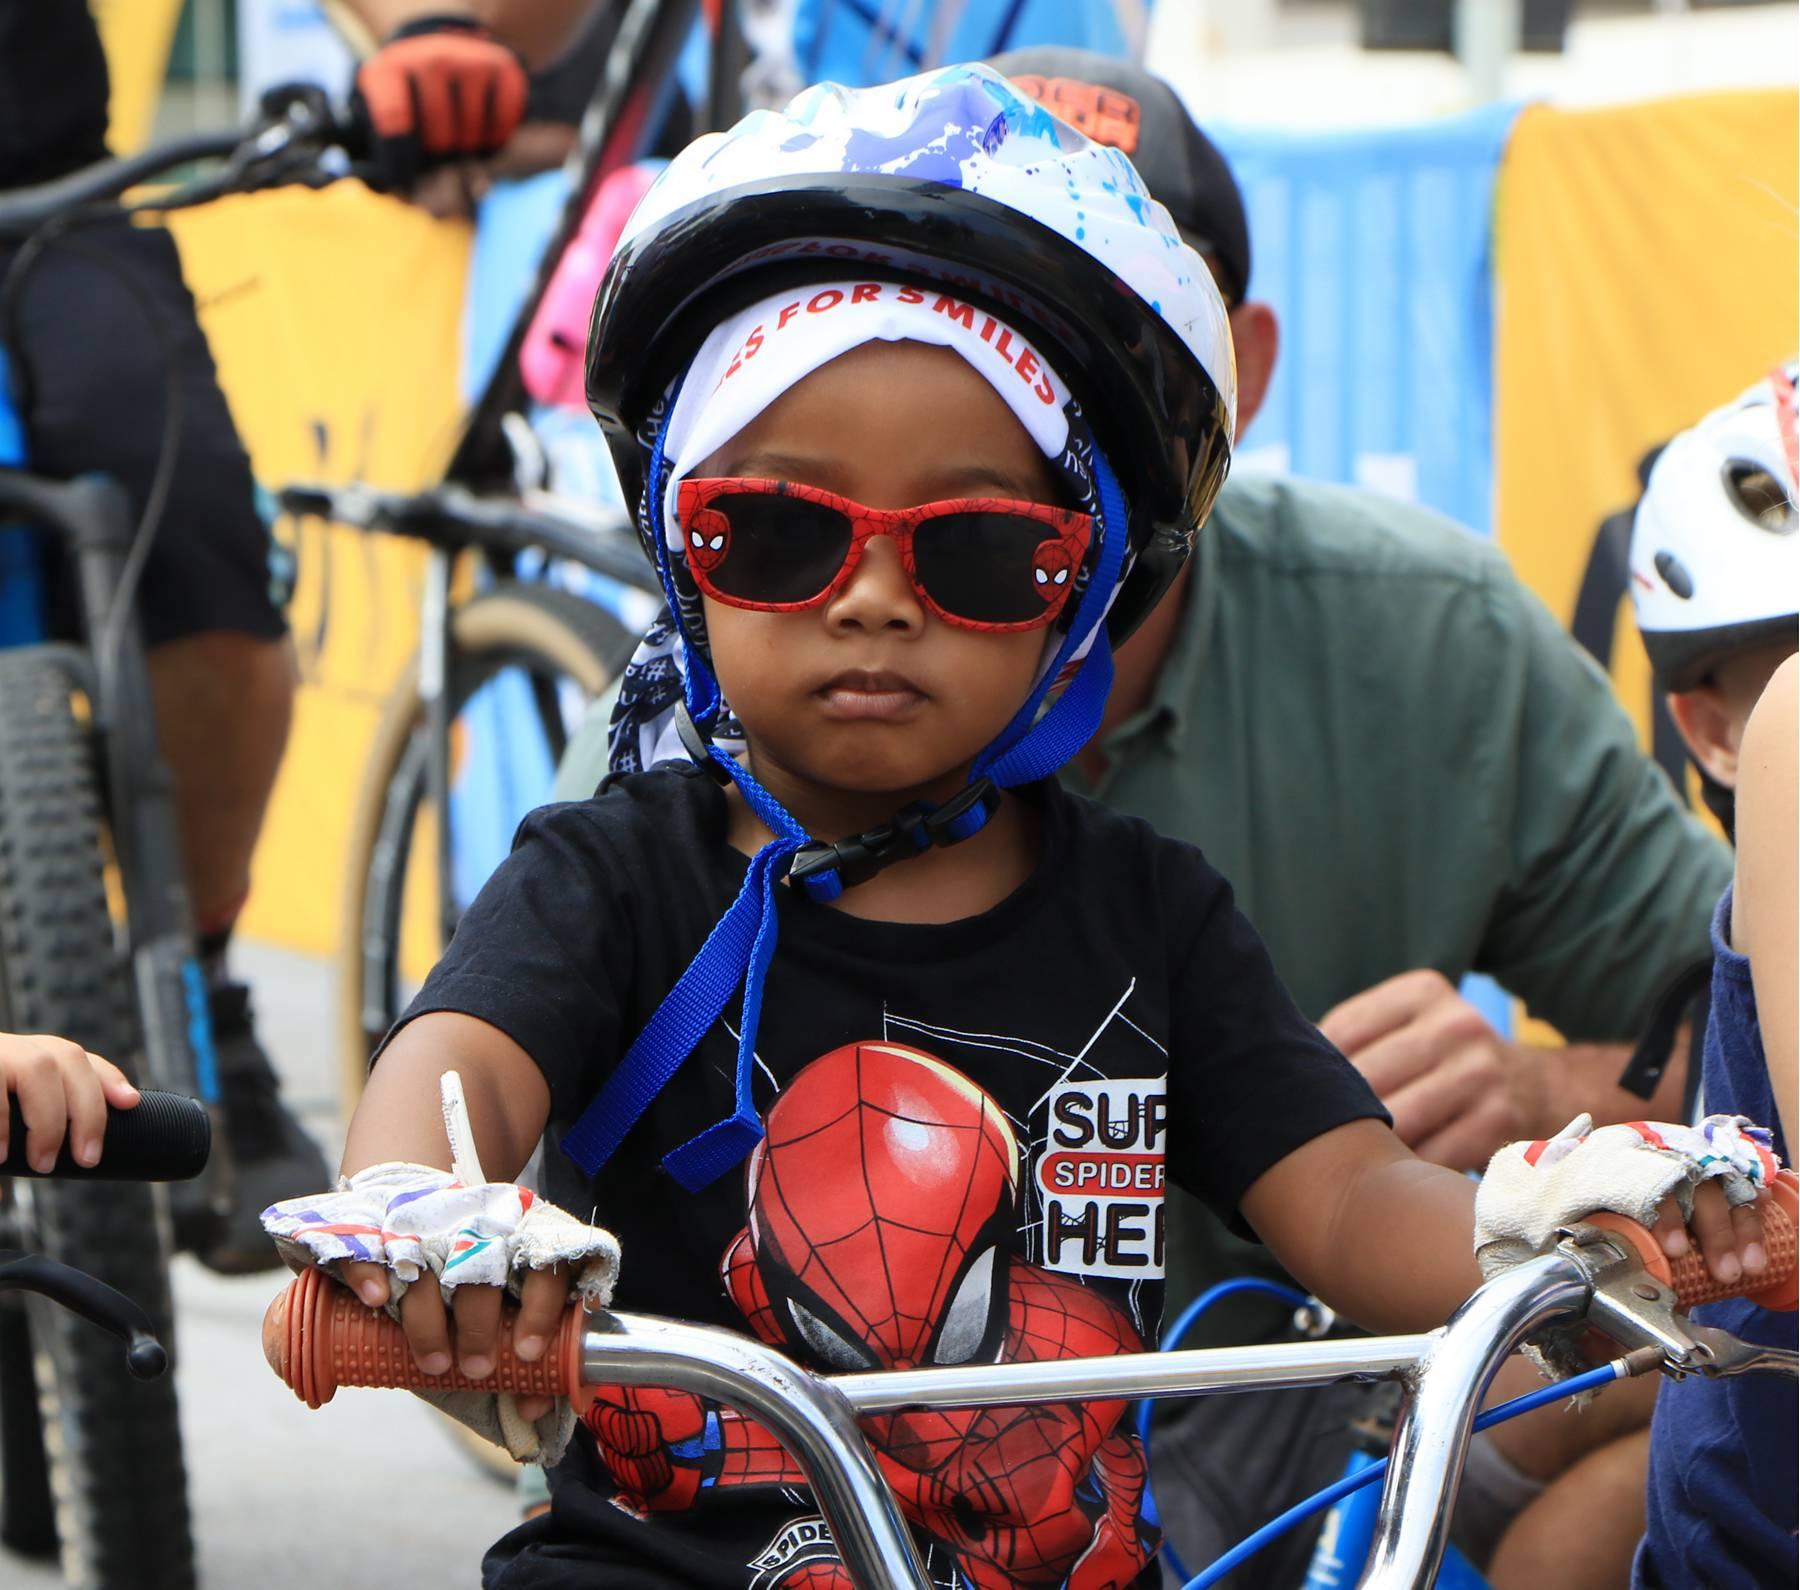 The Herald Conti Kiddies Cycle Race374.JPG